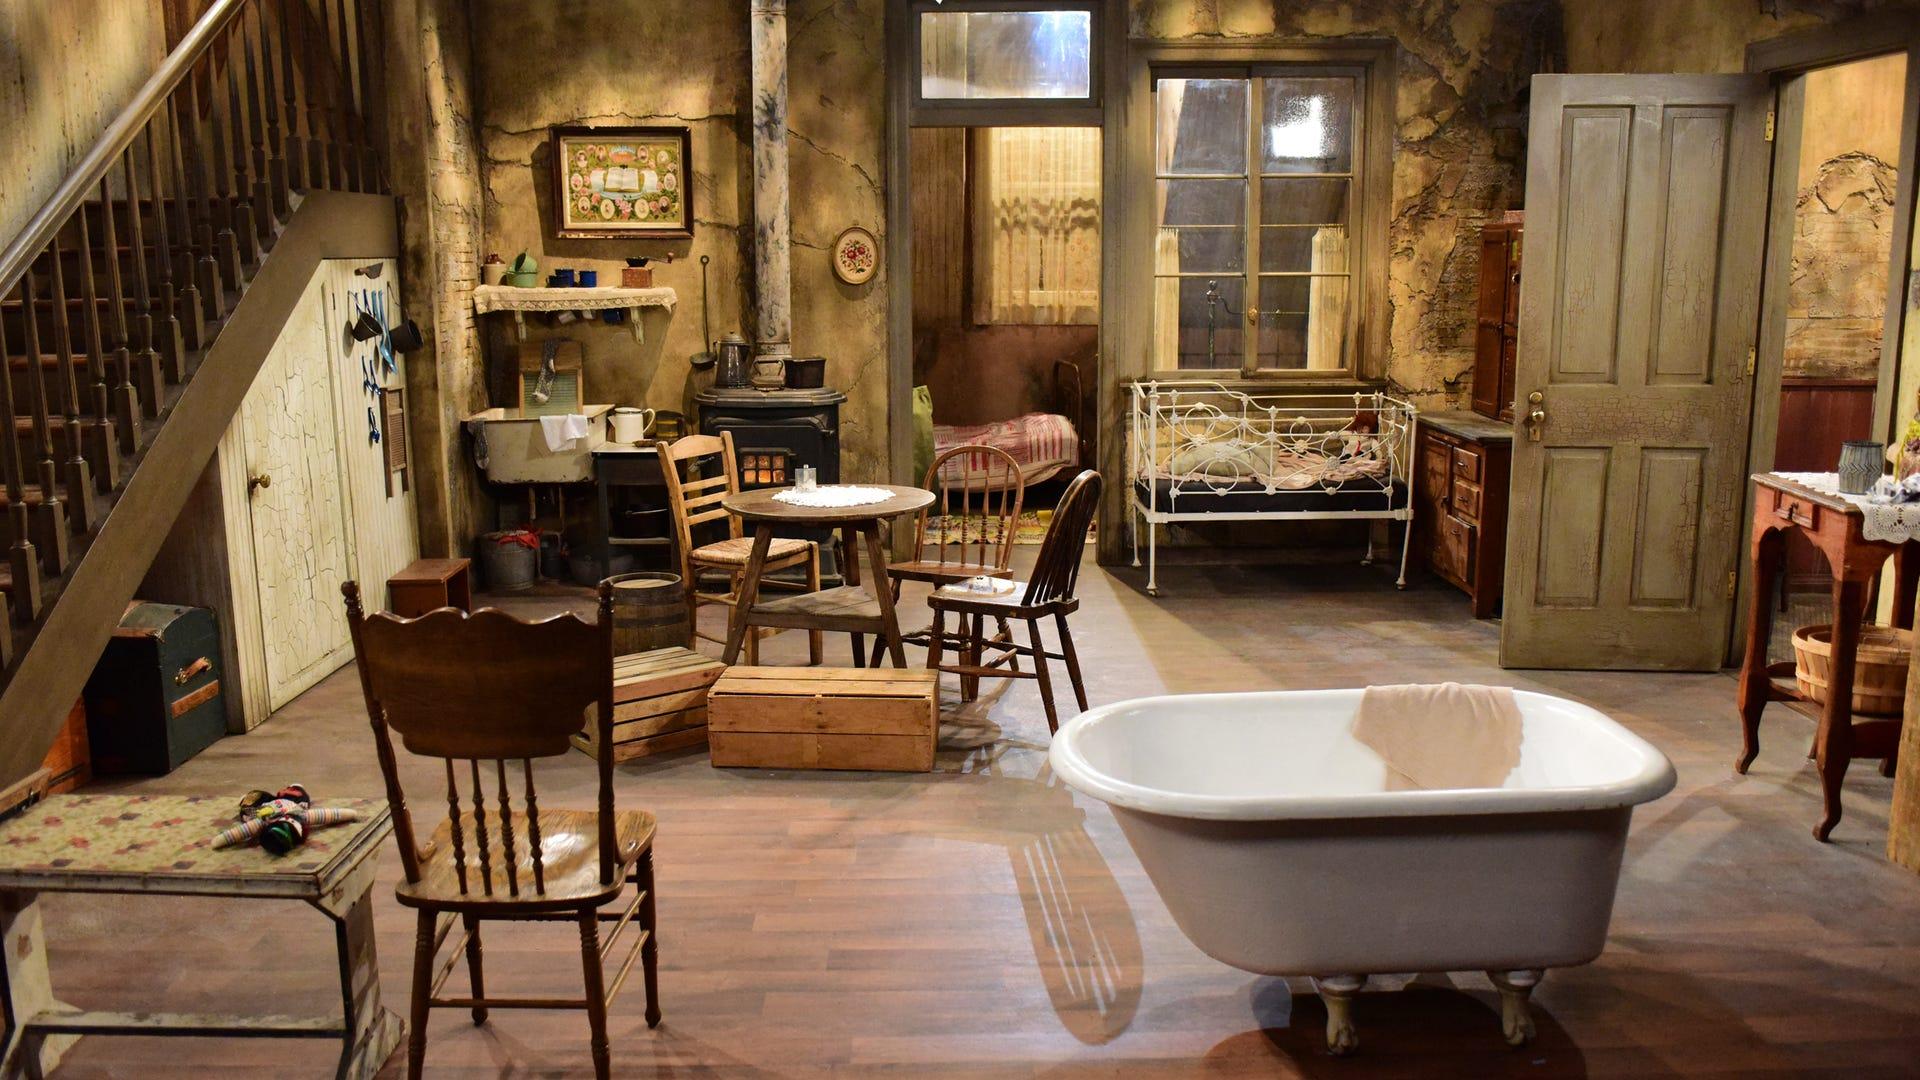 Will & Grace, Karolyn O'Malley room